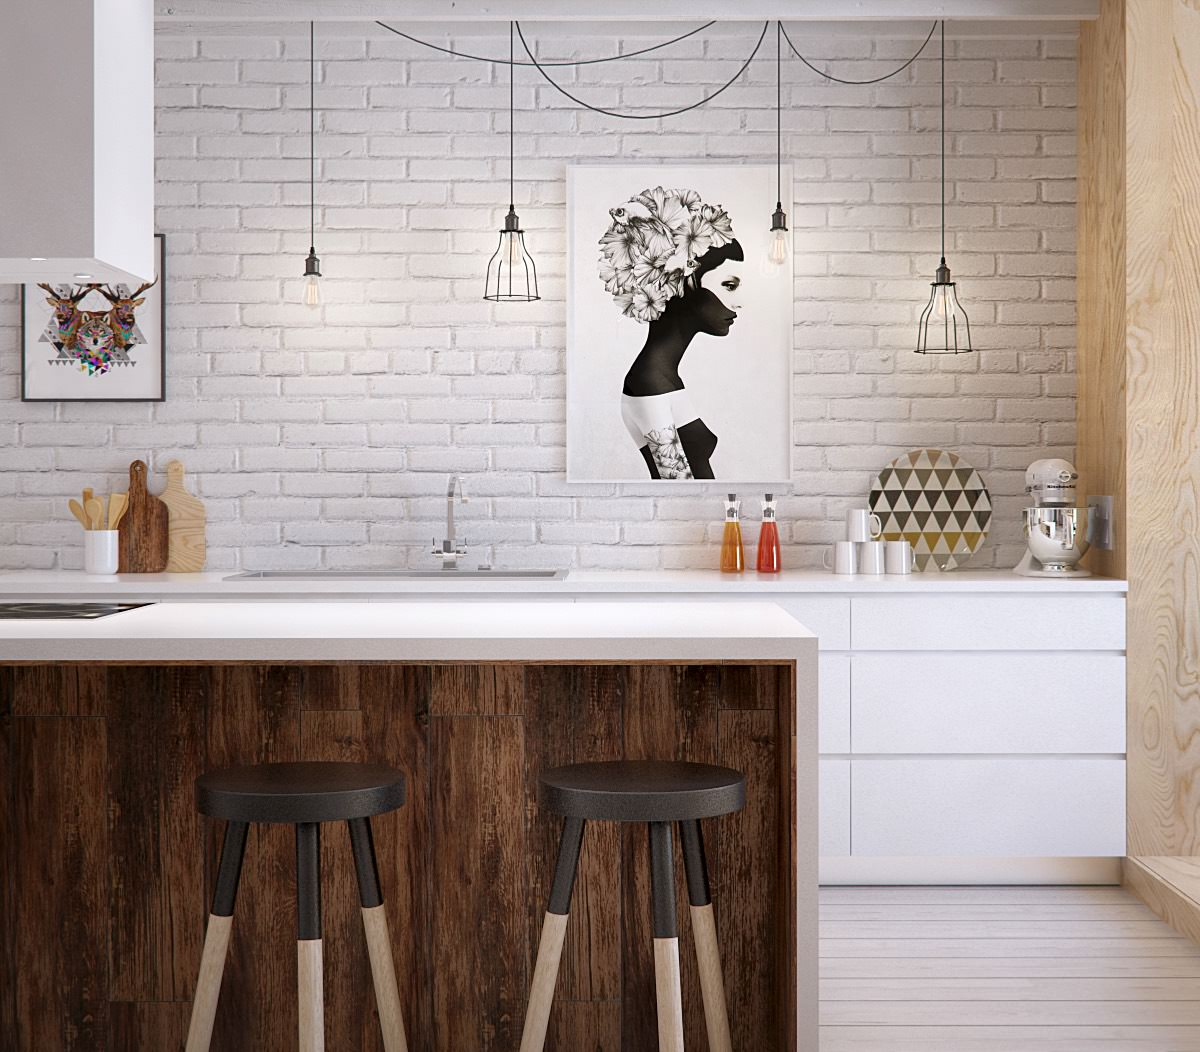 artistic comtemporary kitchen design